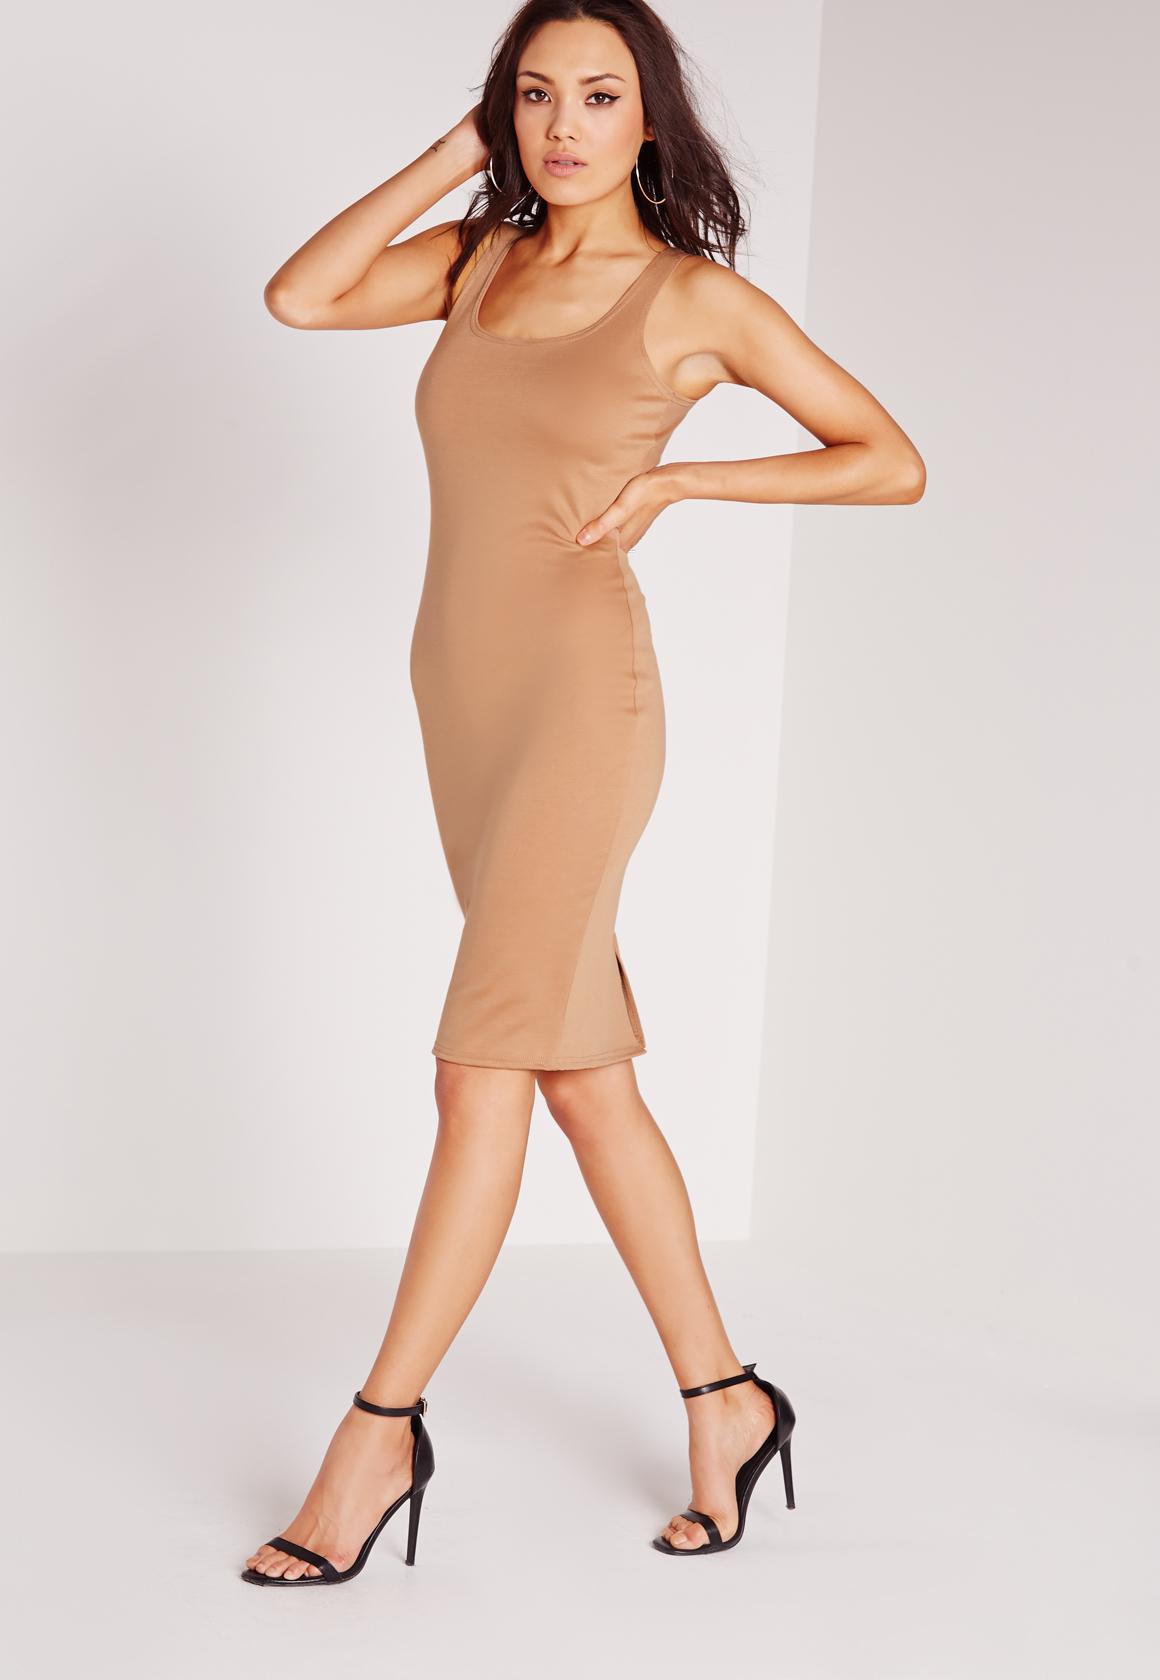 Nude Dresses | Beige & Camel Dresses - Missguided